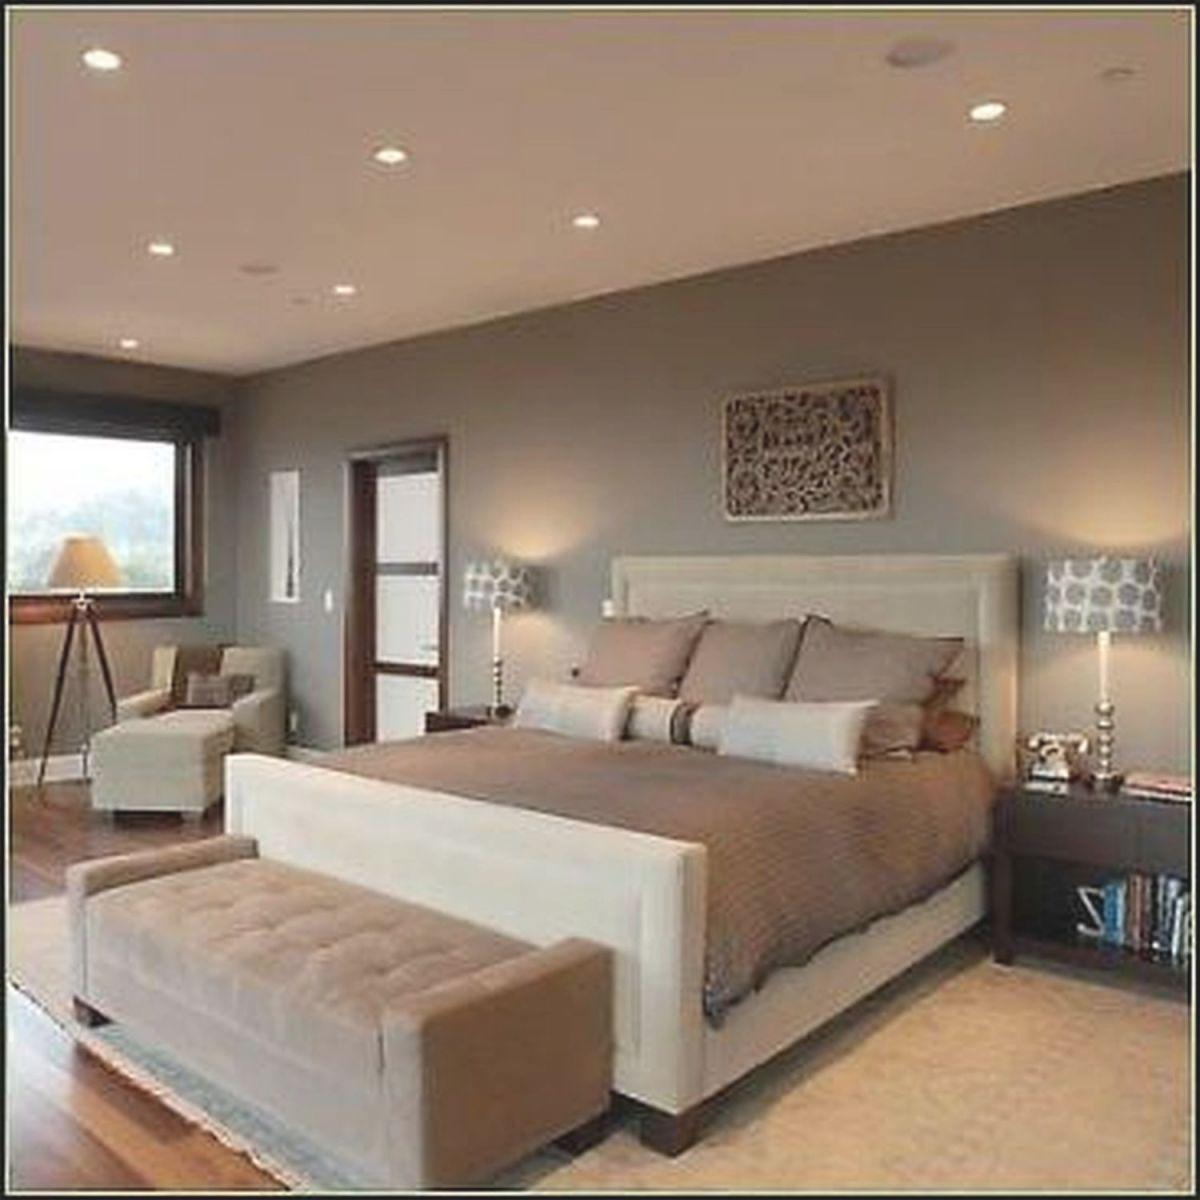 Bedroom : Bedroom Master Bedroom Wall Decorating Ideas with Beautiful Master Bedroom Wall Decor Ideas